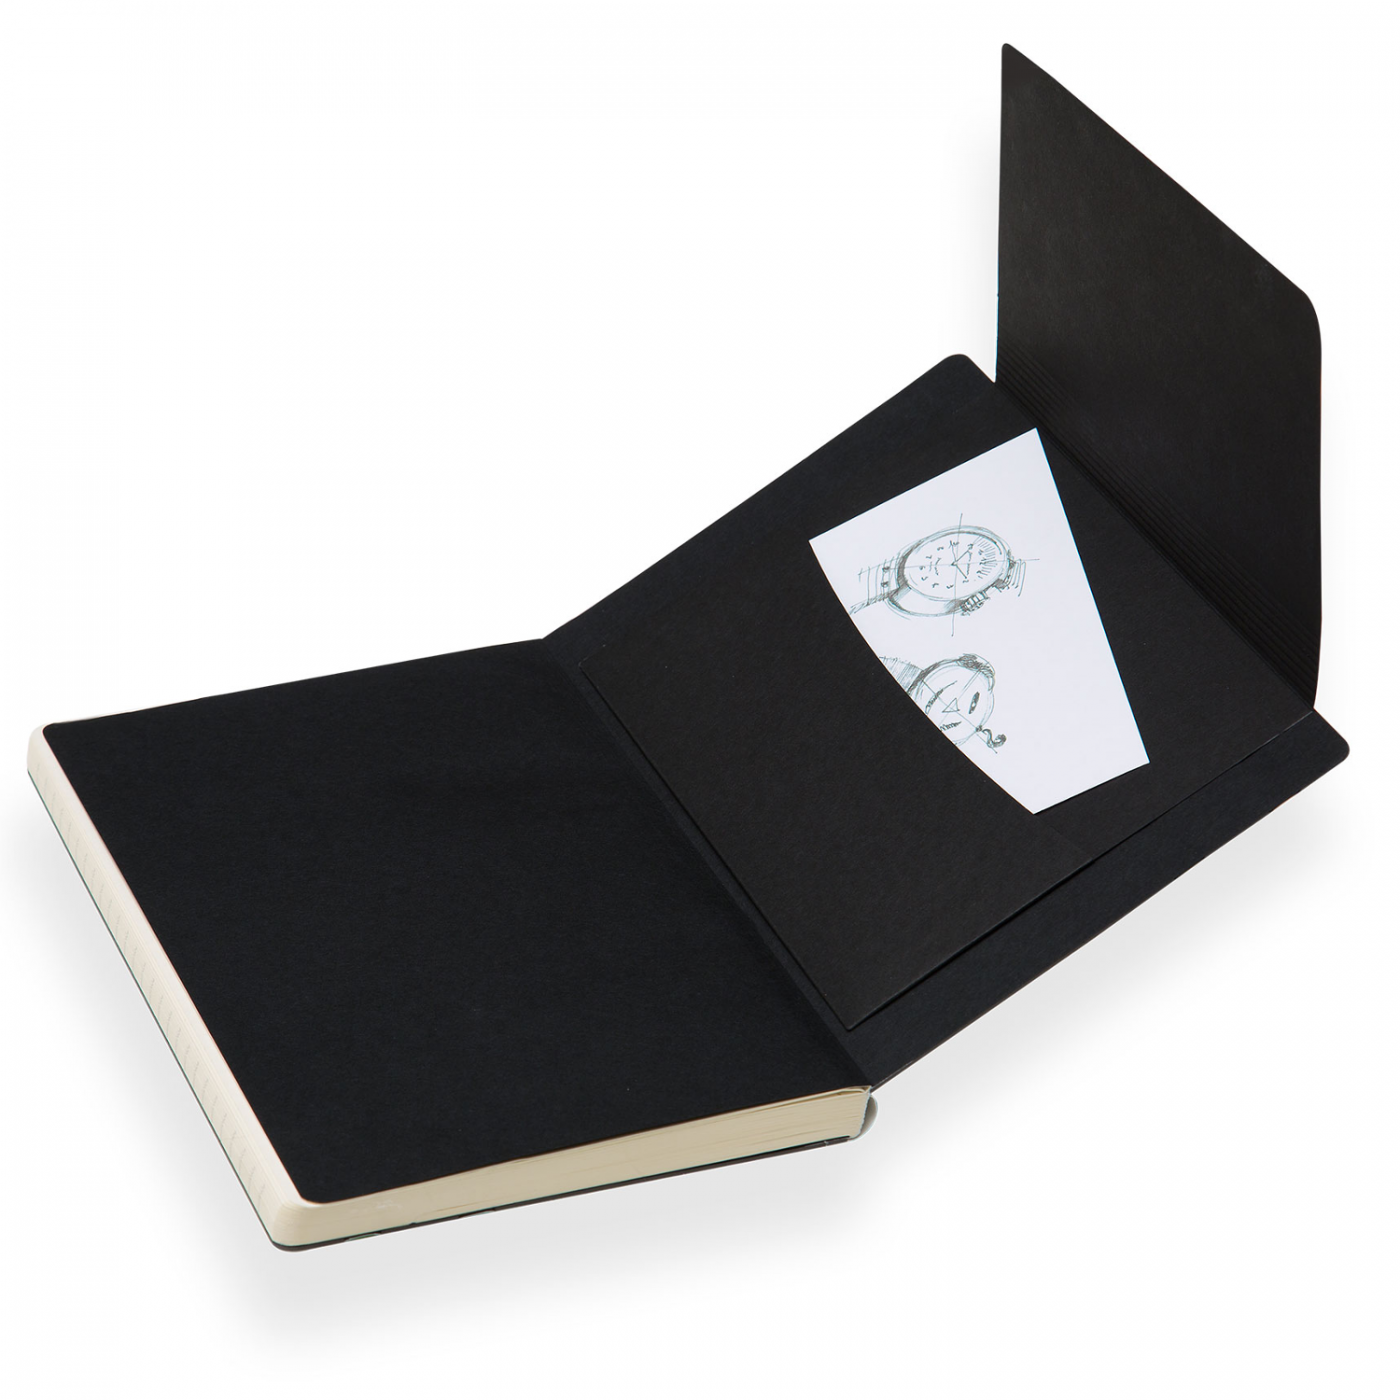 STIFFLEXIBLE taccuino righe, copertina flessibile, 9x14 cm, I